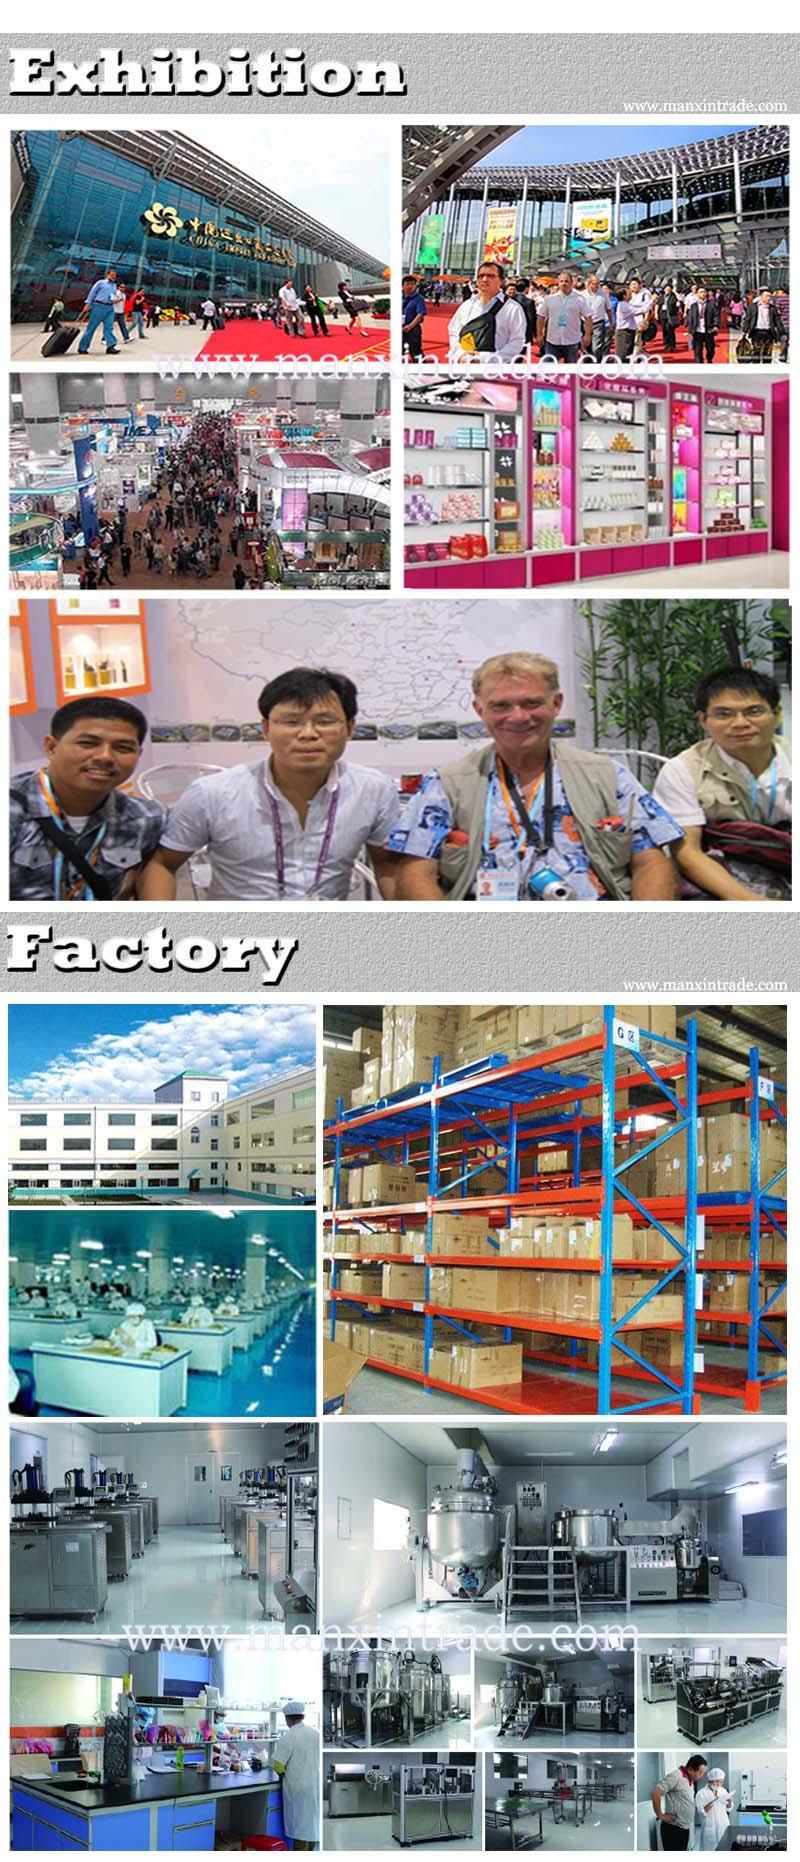 exhibition&factory.jpg